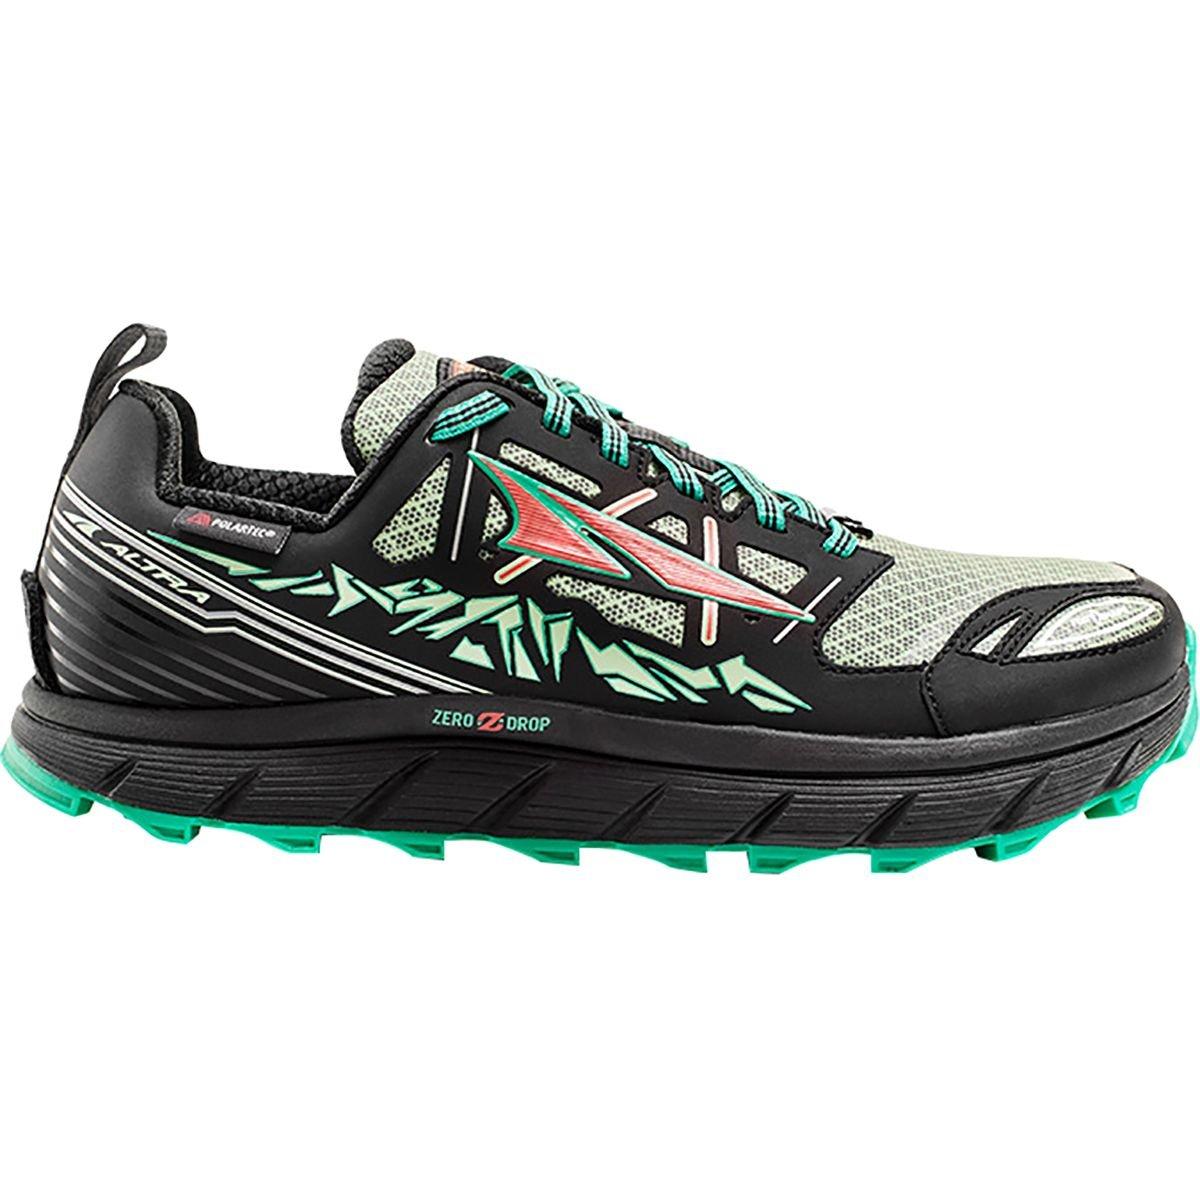 Altra Lone Peak 3.0 Low Neo Shoe - Women's B01B72EANW 9 B(M) US|Black/Mint